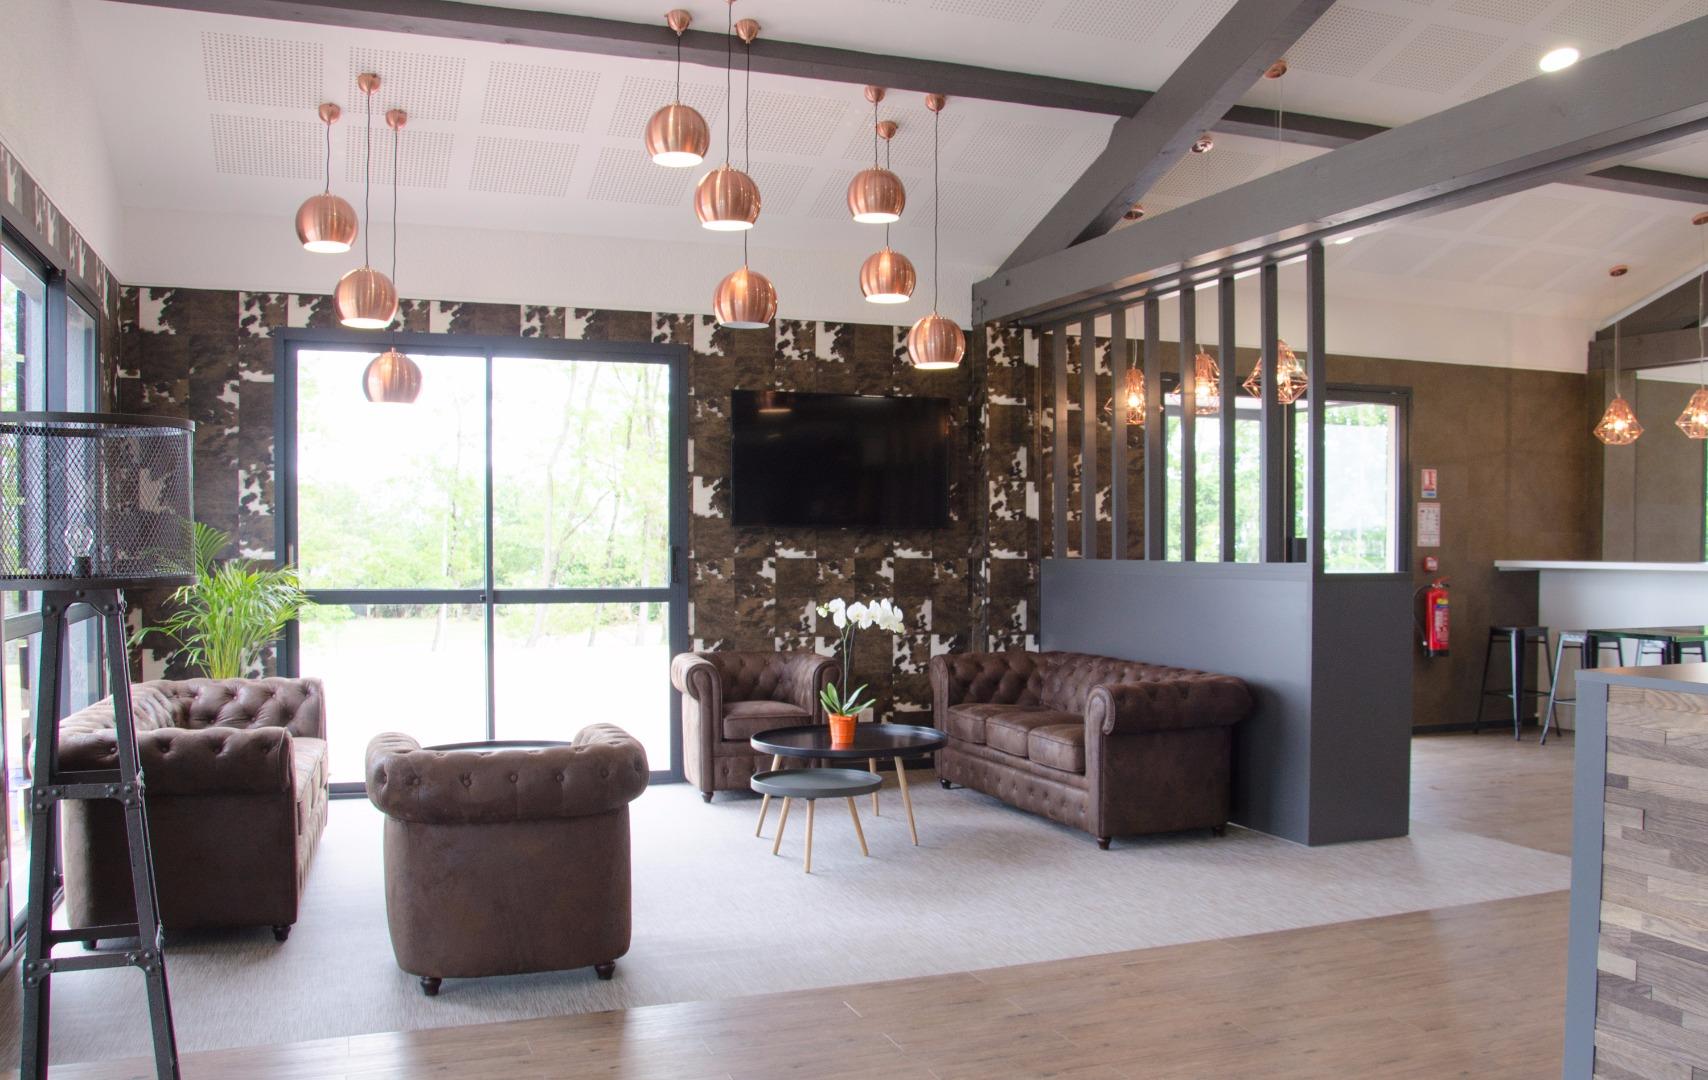 galerie photos comfort hotel agen le passage. Black Bedroom Furniture Sets. Home Design Ideas